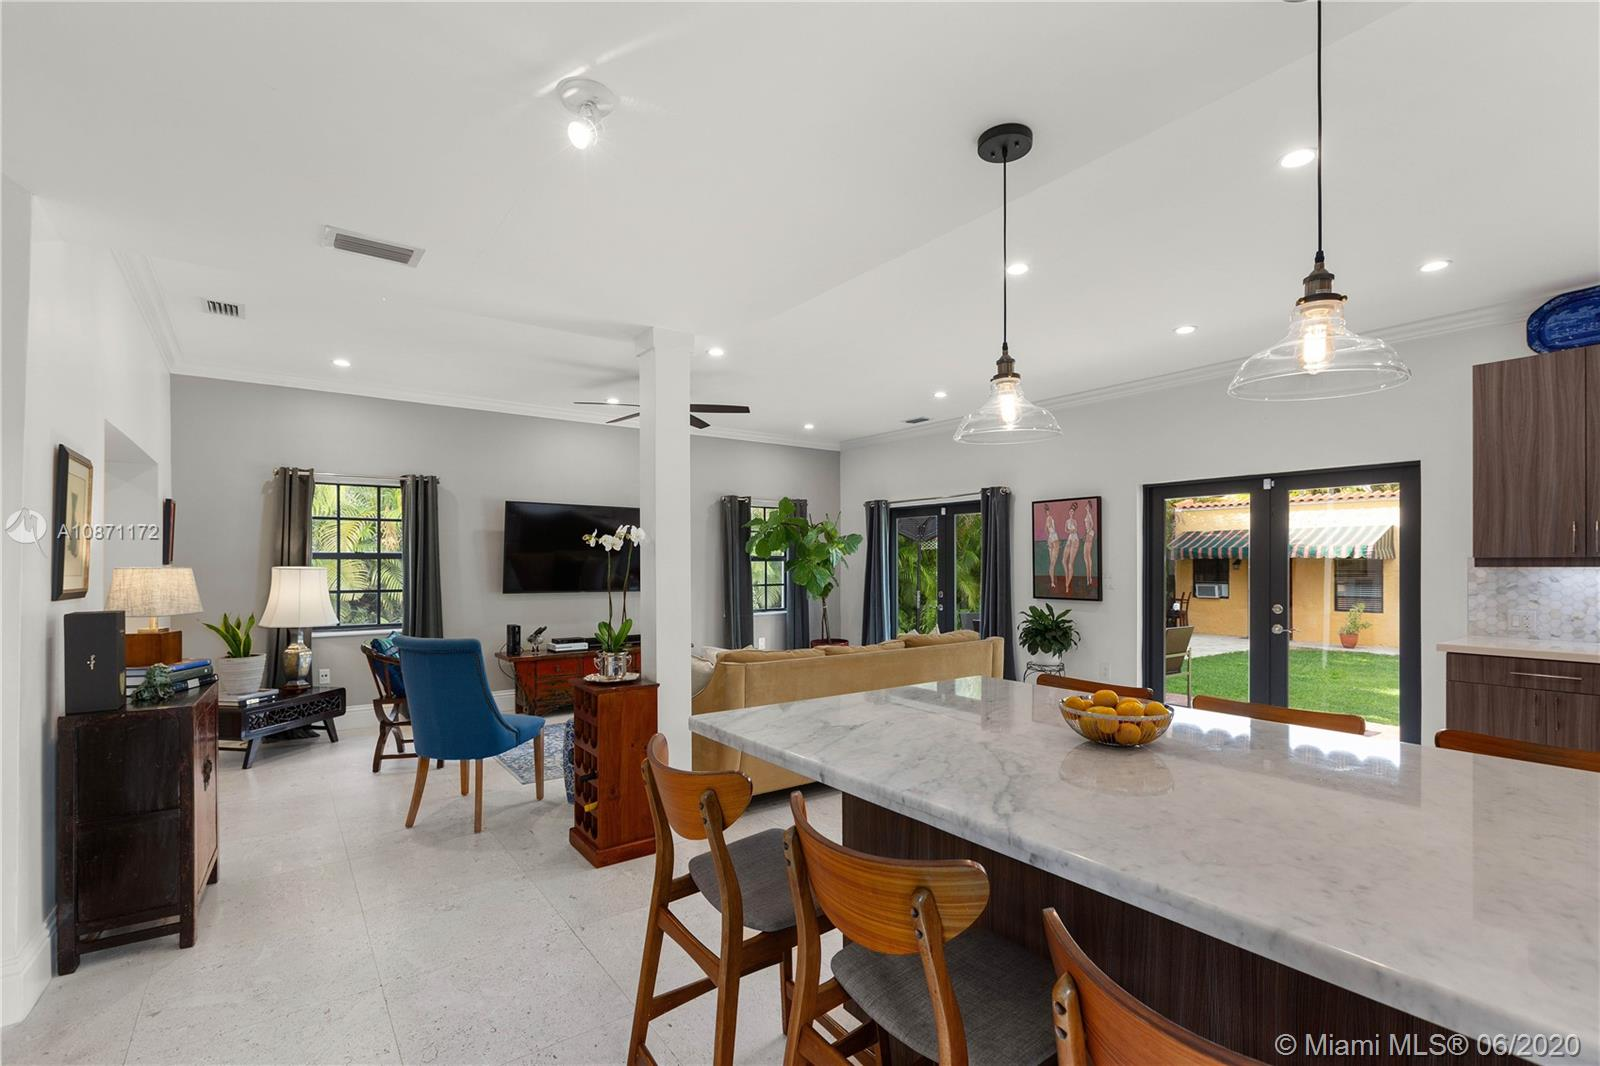 1329 Obispo Ave, Coral Gables, Florida 33134, 4 Bedrooms Bedrooms, ,4 BathroomsBathrooms,Residential,For Sale,1329 Obispo Ave,A10871172